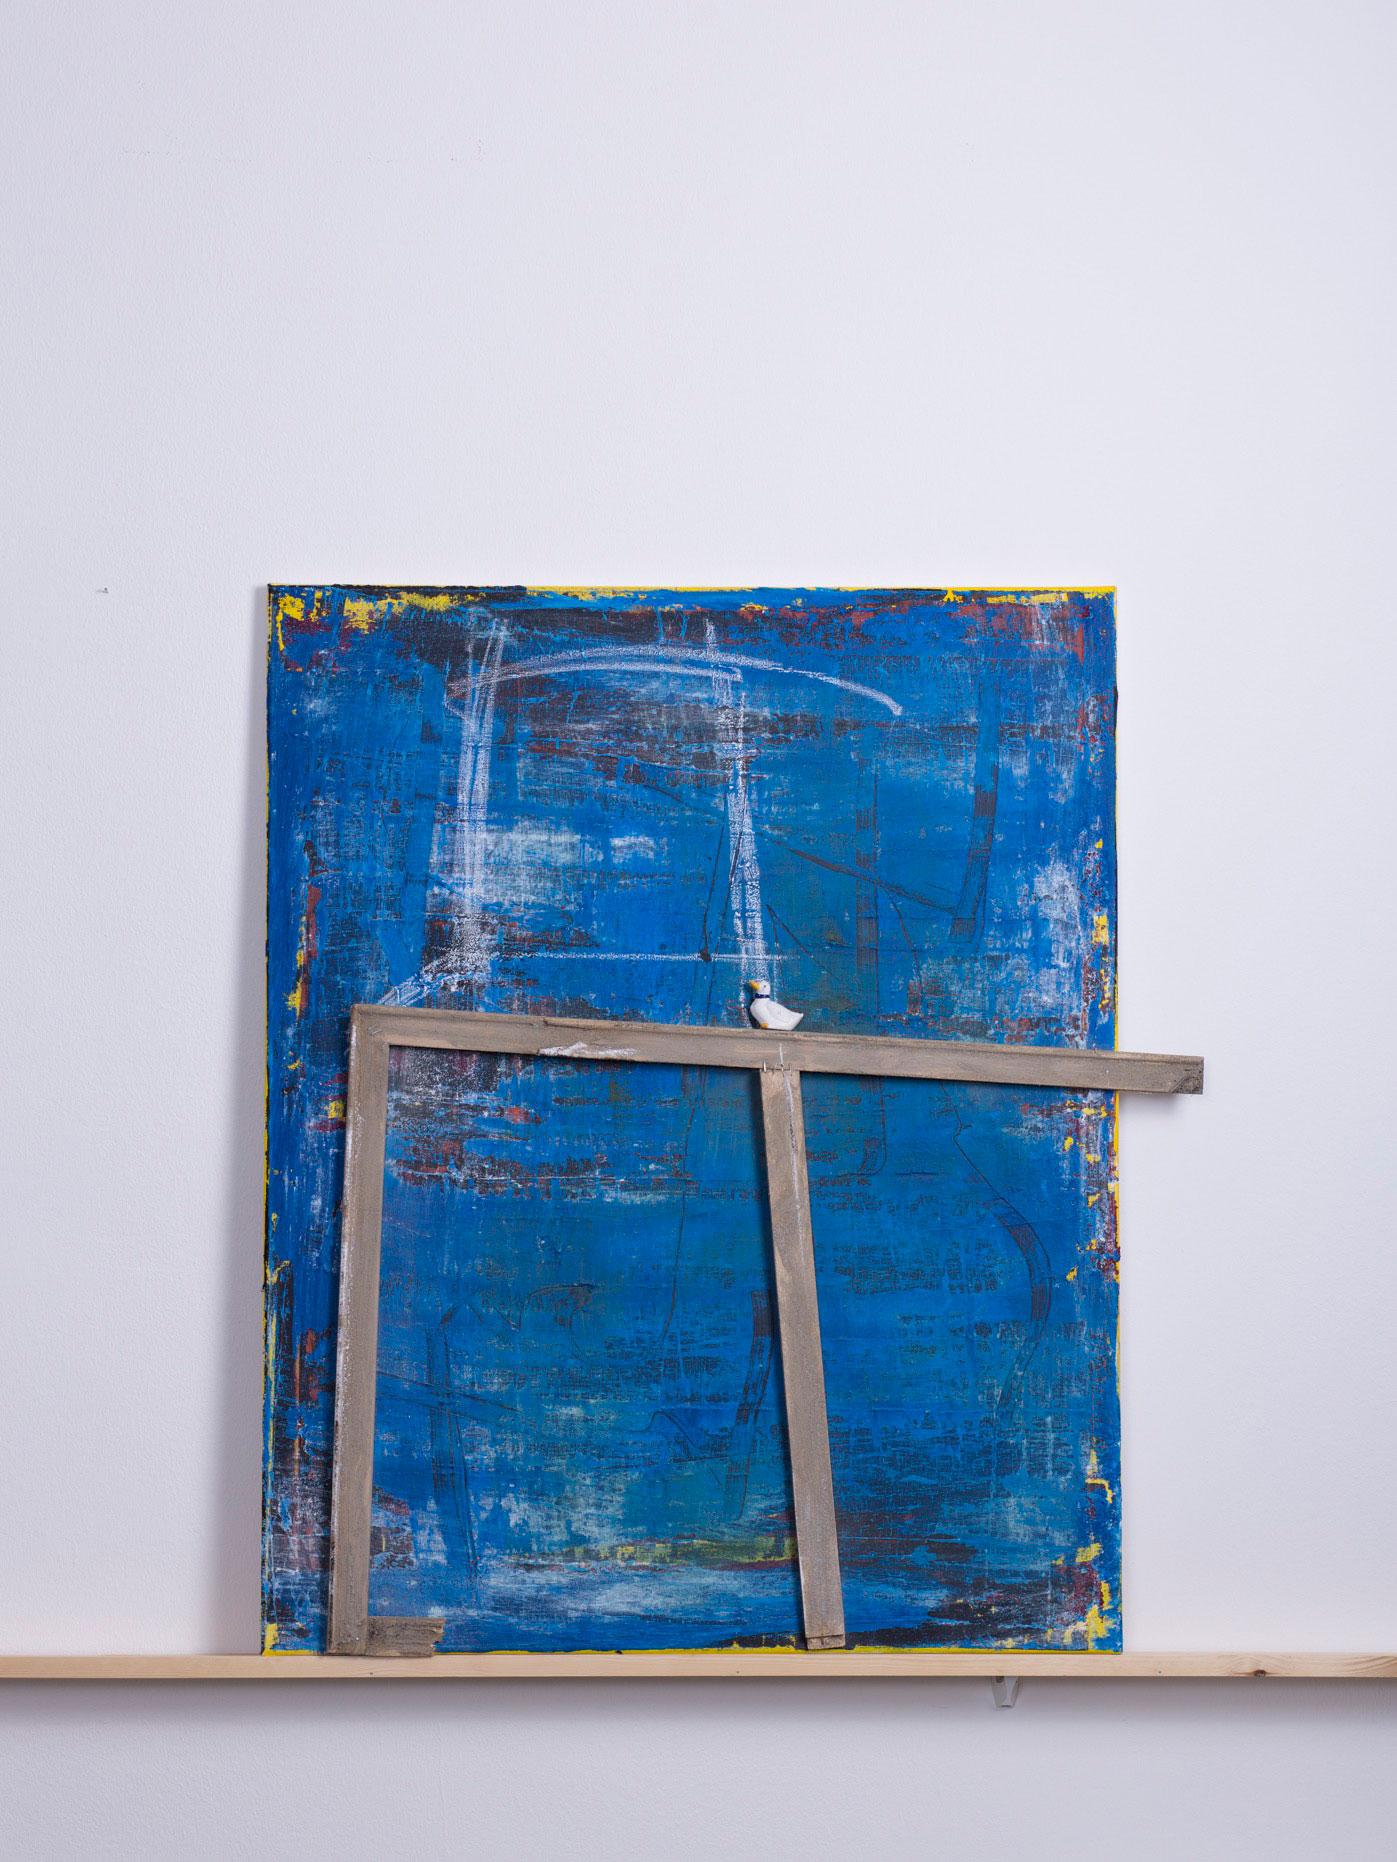 regnum anas, 2013 - 80c100 cm,<br> Acryl, Holz und Kreide auf Leinwand